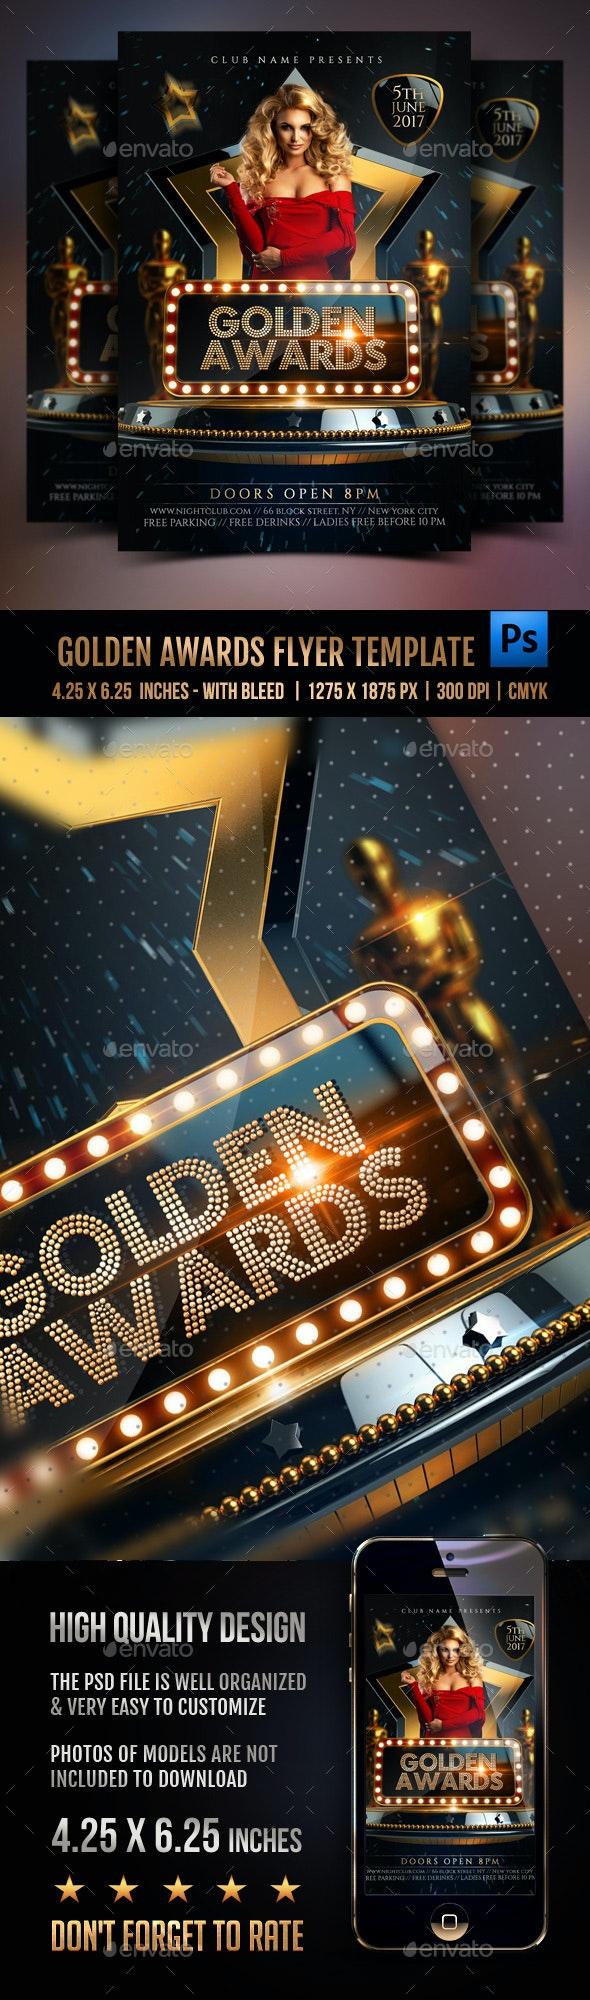 Golden Awards Flyer Template - Events Flyers